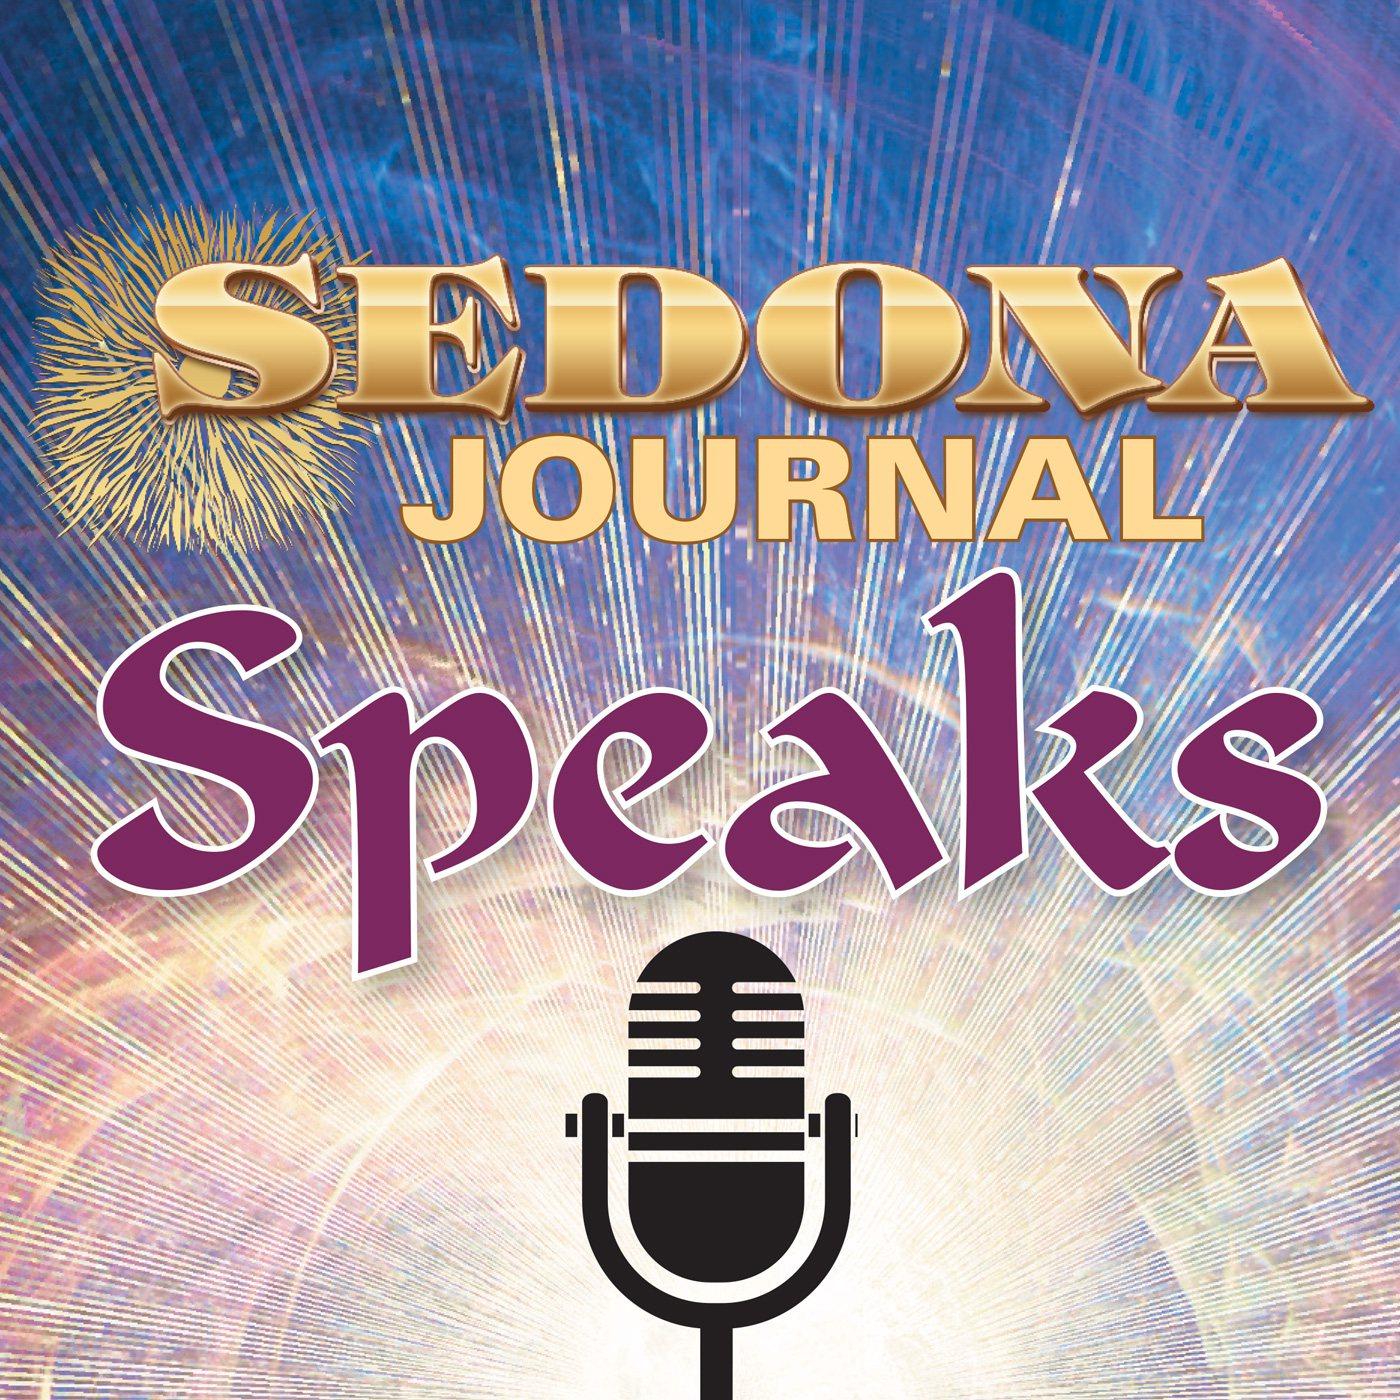 Sedona Journal Speaks